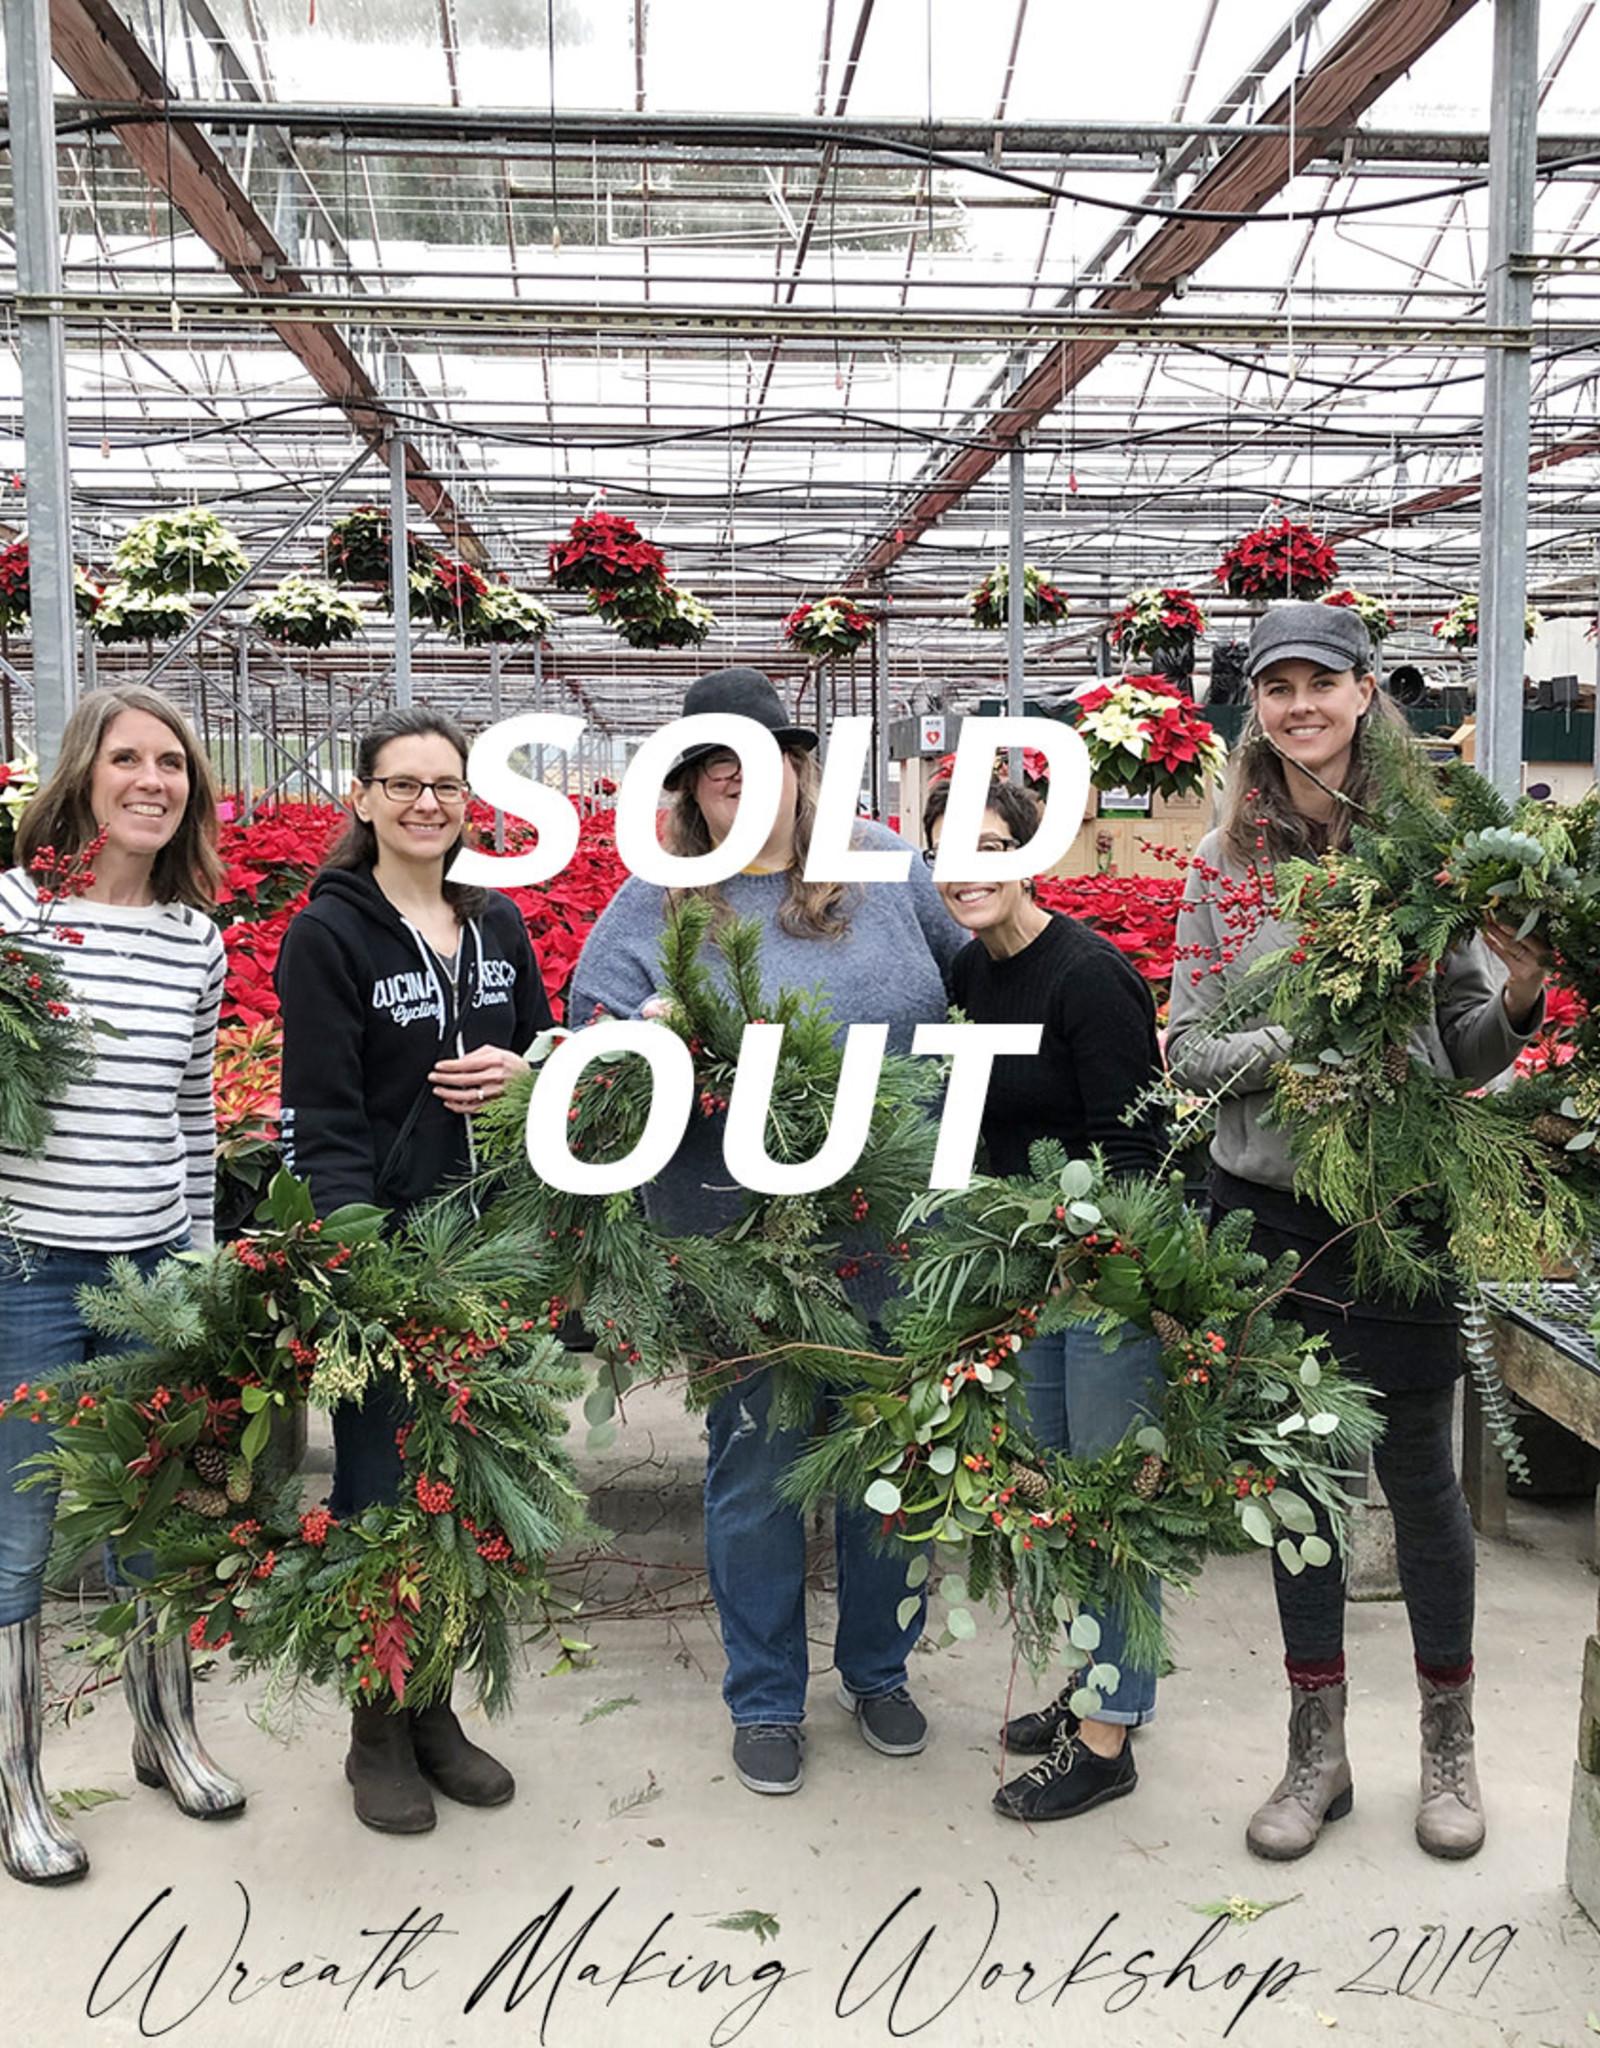 Squak Mtn Wreath Making Workshop (5 people), 11/11/20 2:30pm